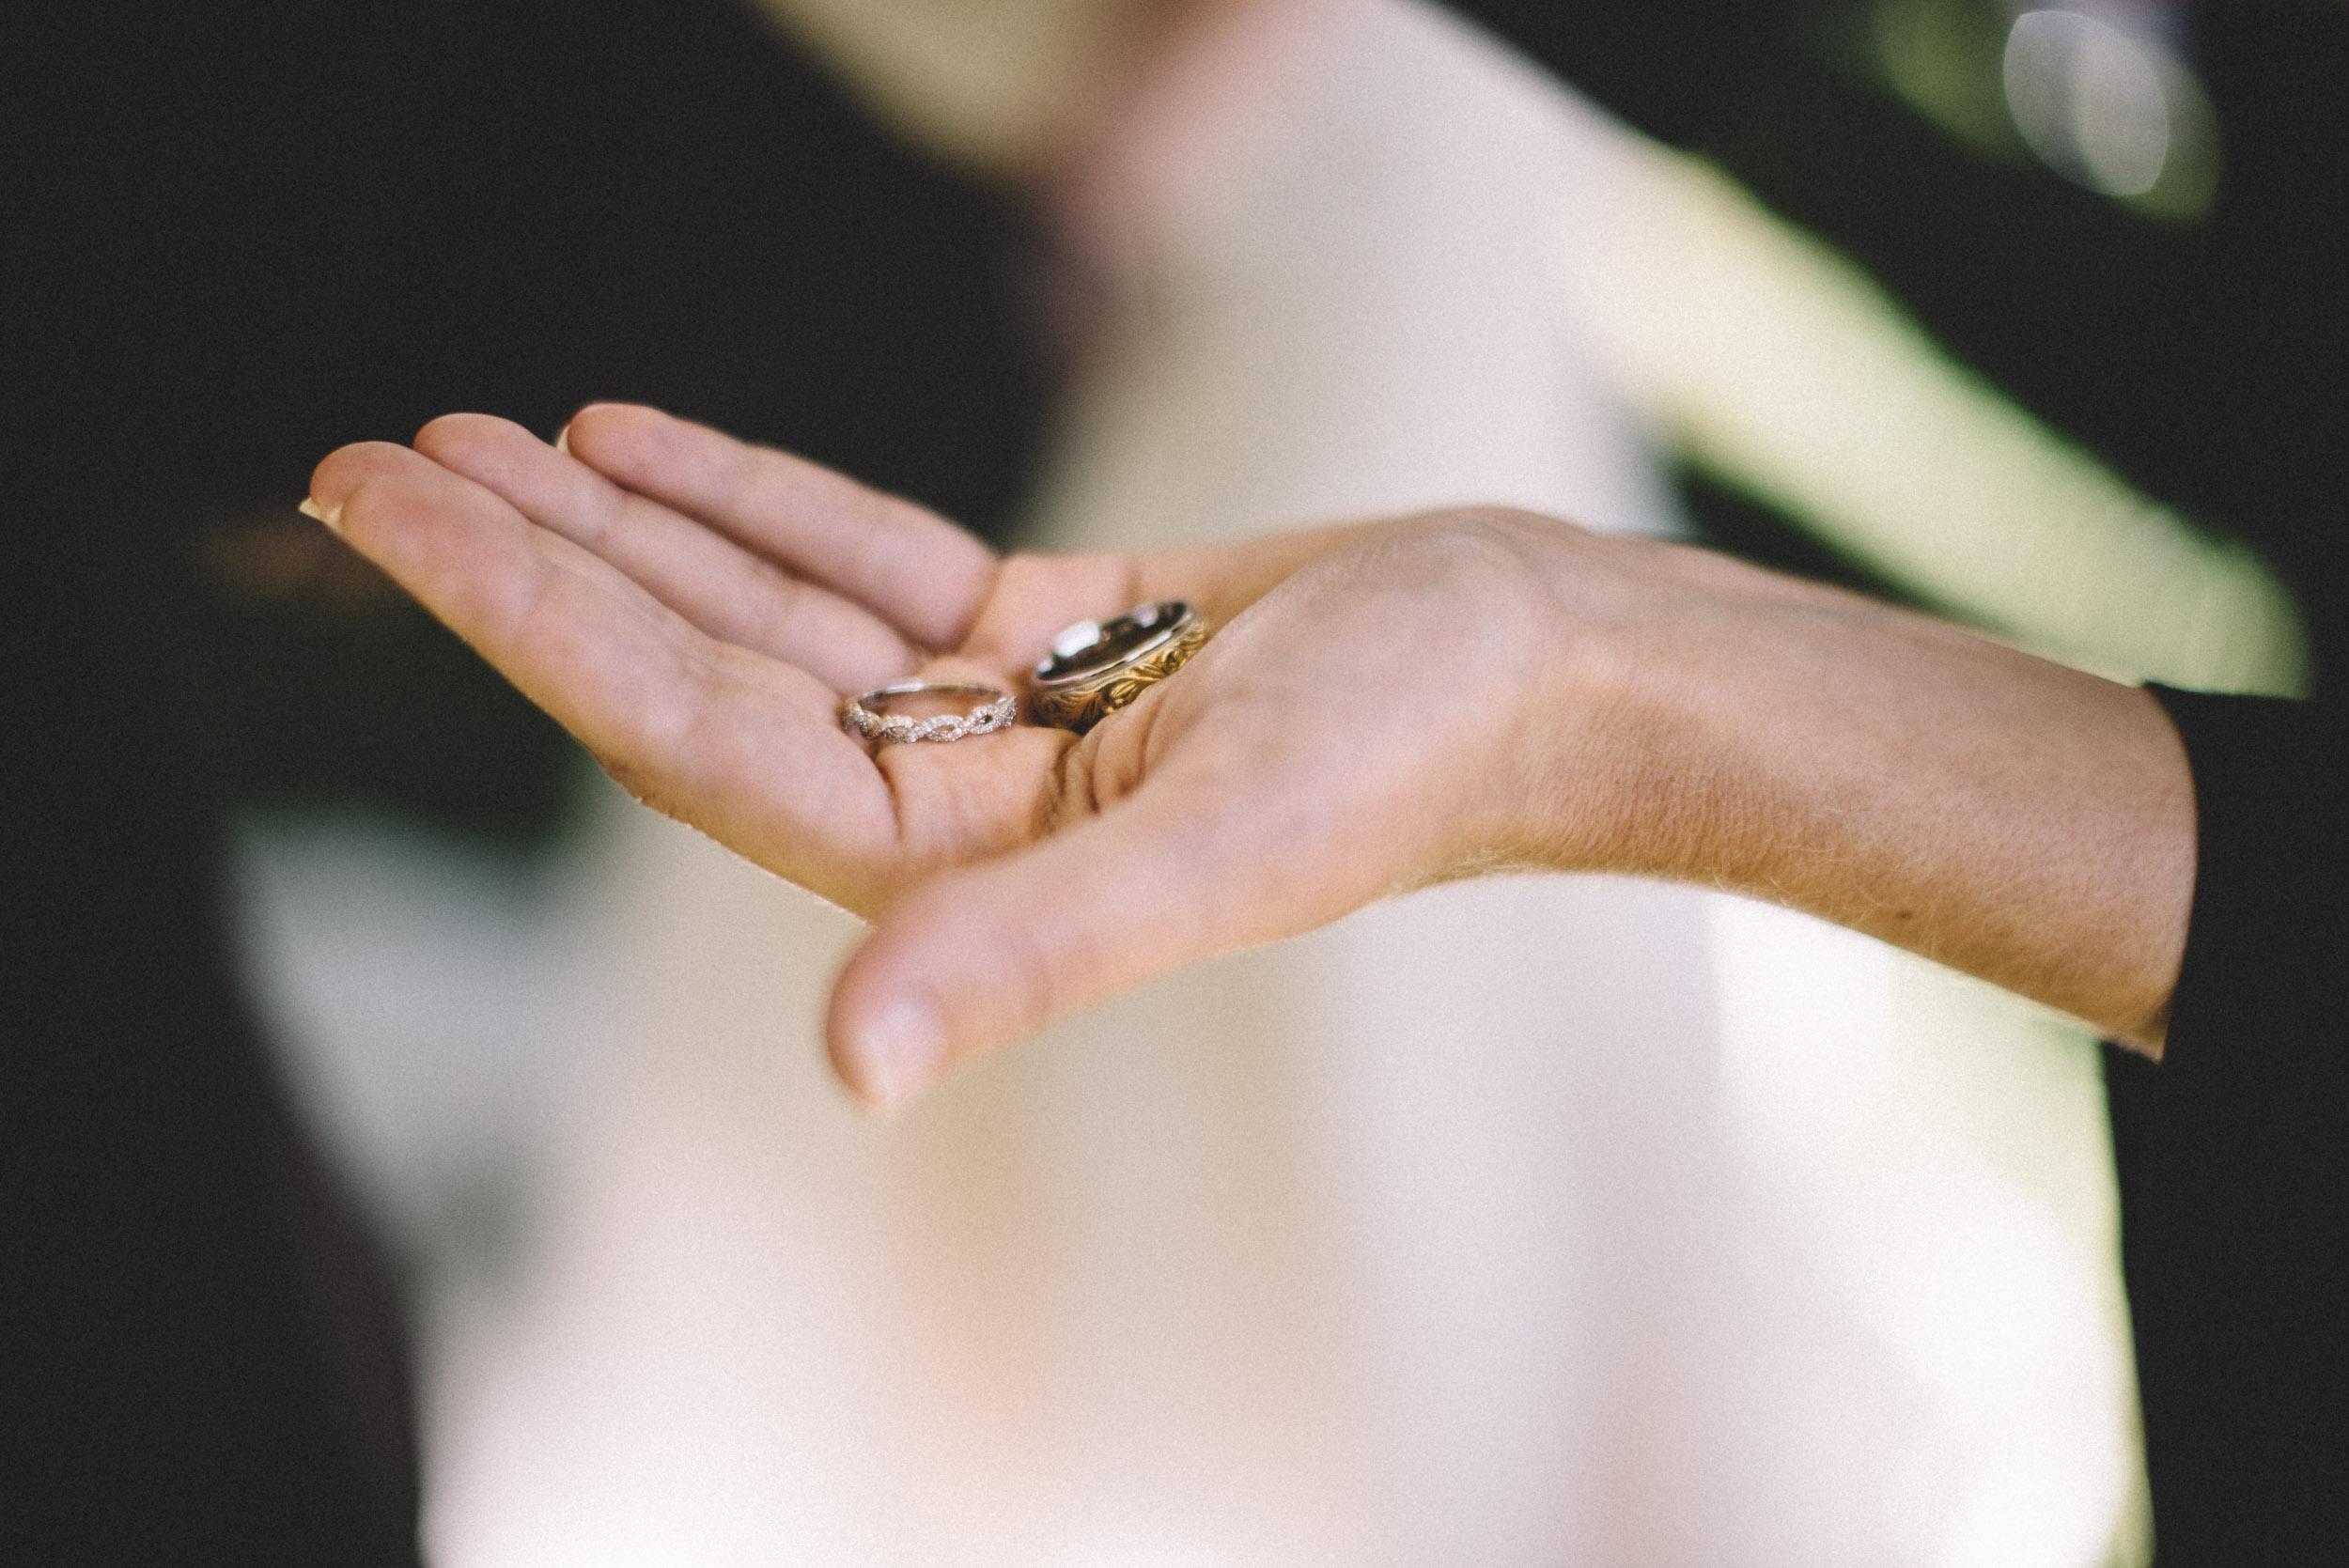 Gaie-Lea-Staunton-weddding-photographer-52.jpg